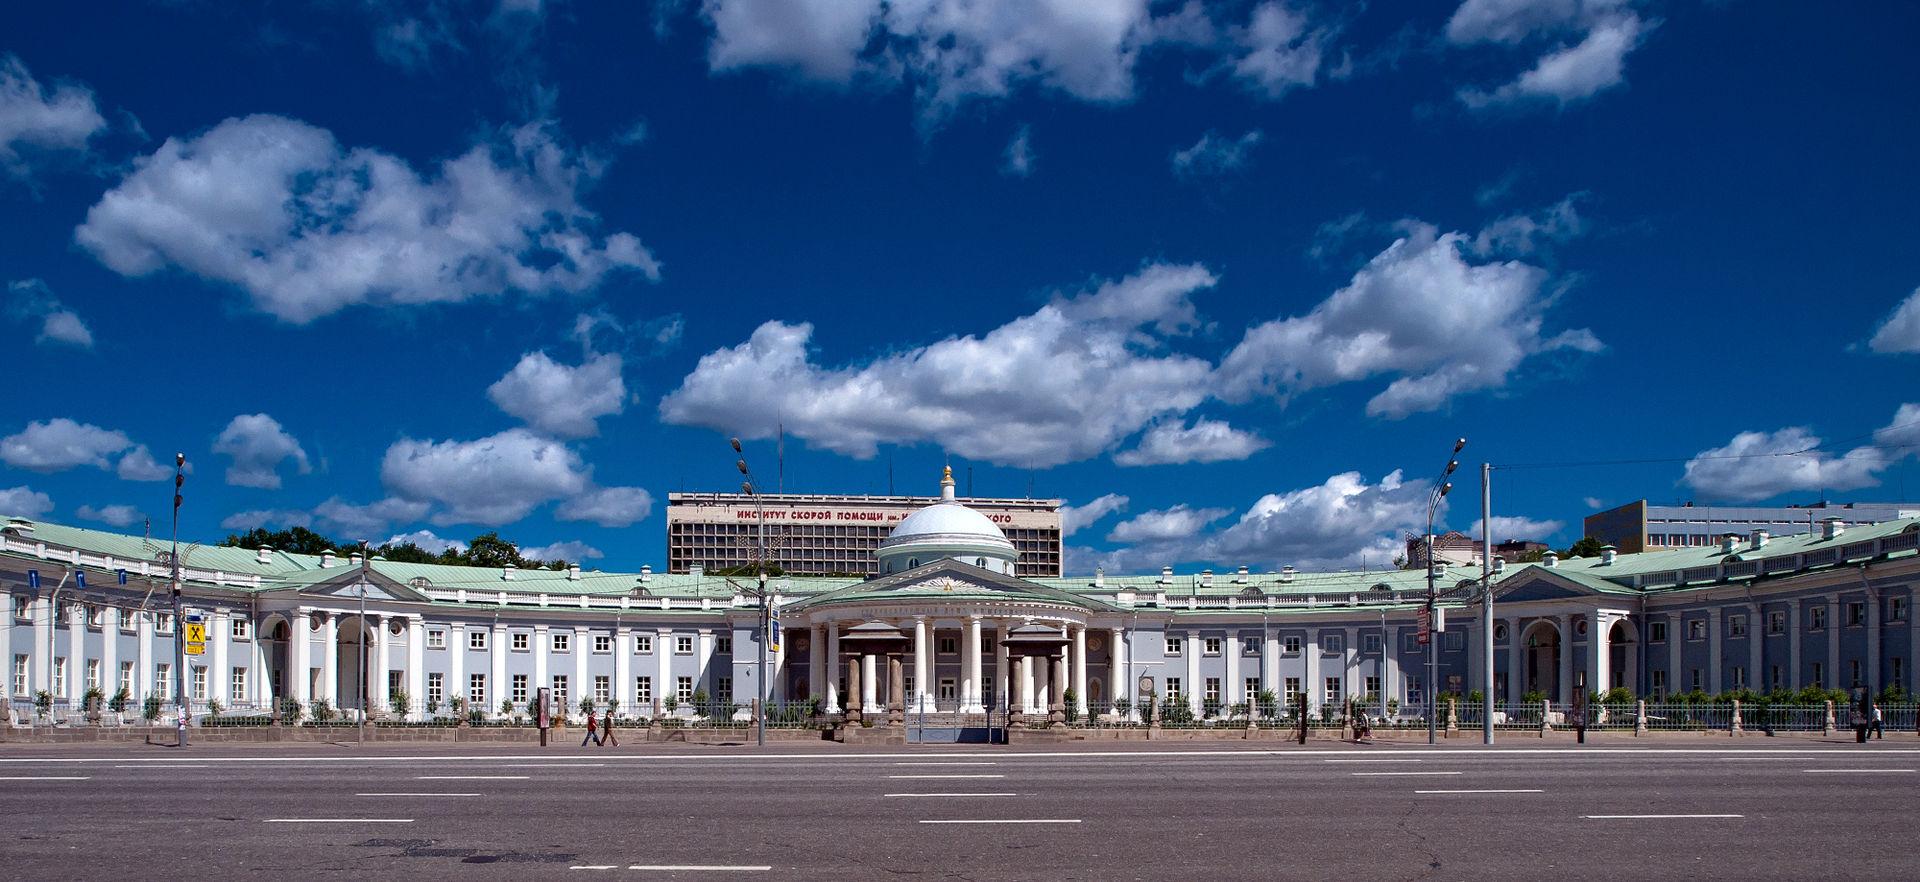 https://upload.wikimedia.org/wikipedia/commons/thumb/6/60/Moscow%2C_Bolshaya_Sukharevskaya_3_pano_June_2010_04.jpg/1920px-Moscow%2C_Bolshaya_Sukharevskaya_3_pano_June_2010_04.jpg